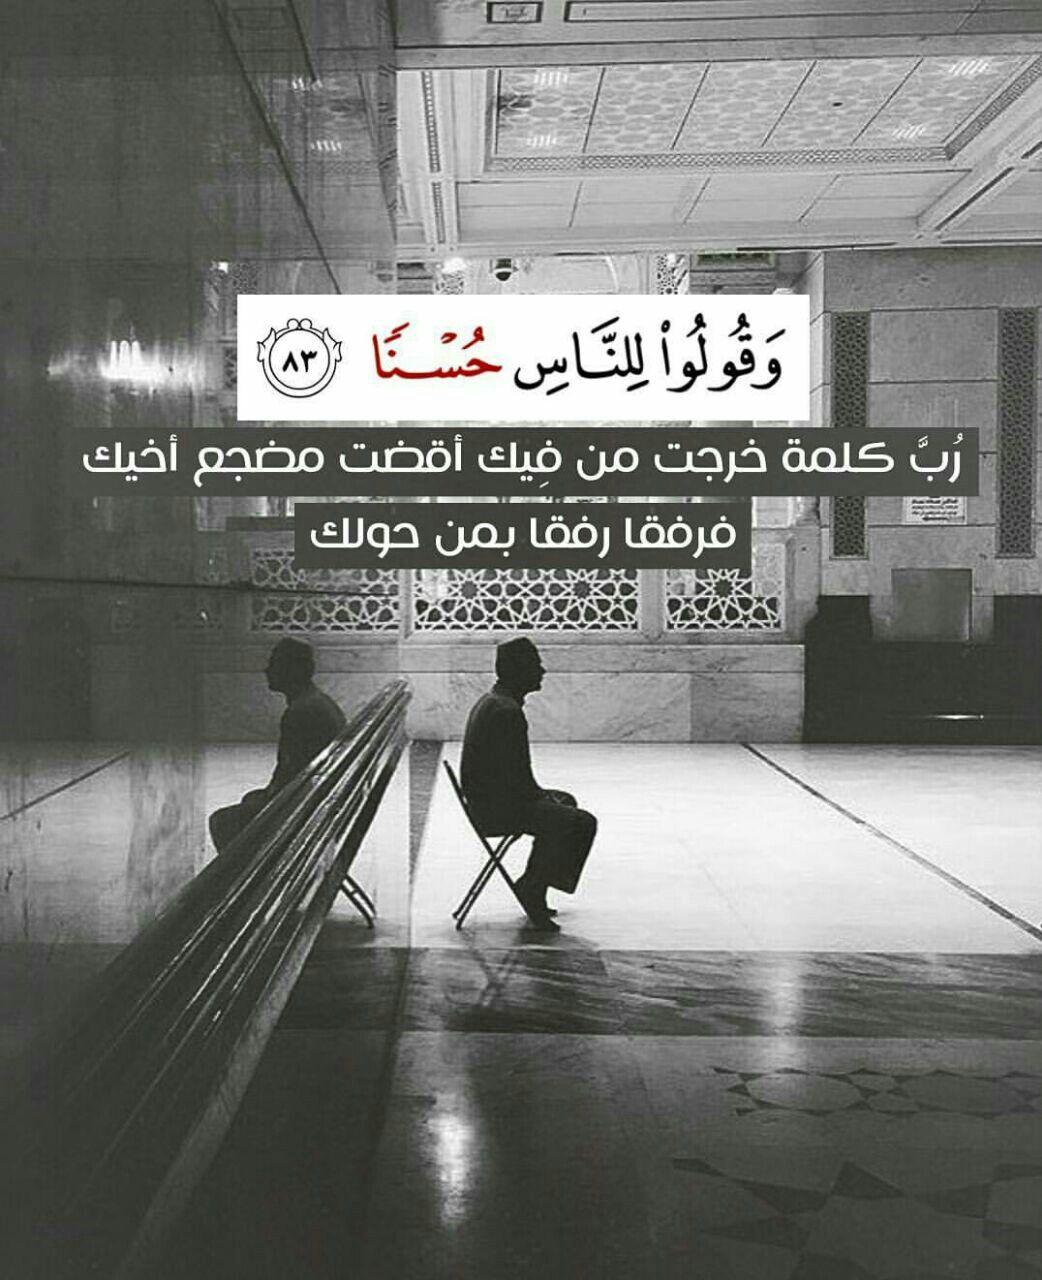 Pin By Razan Masri On همسات دينية Quran Book Quran Quotes Quran Verses